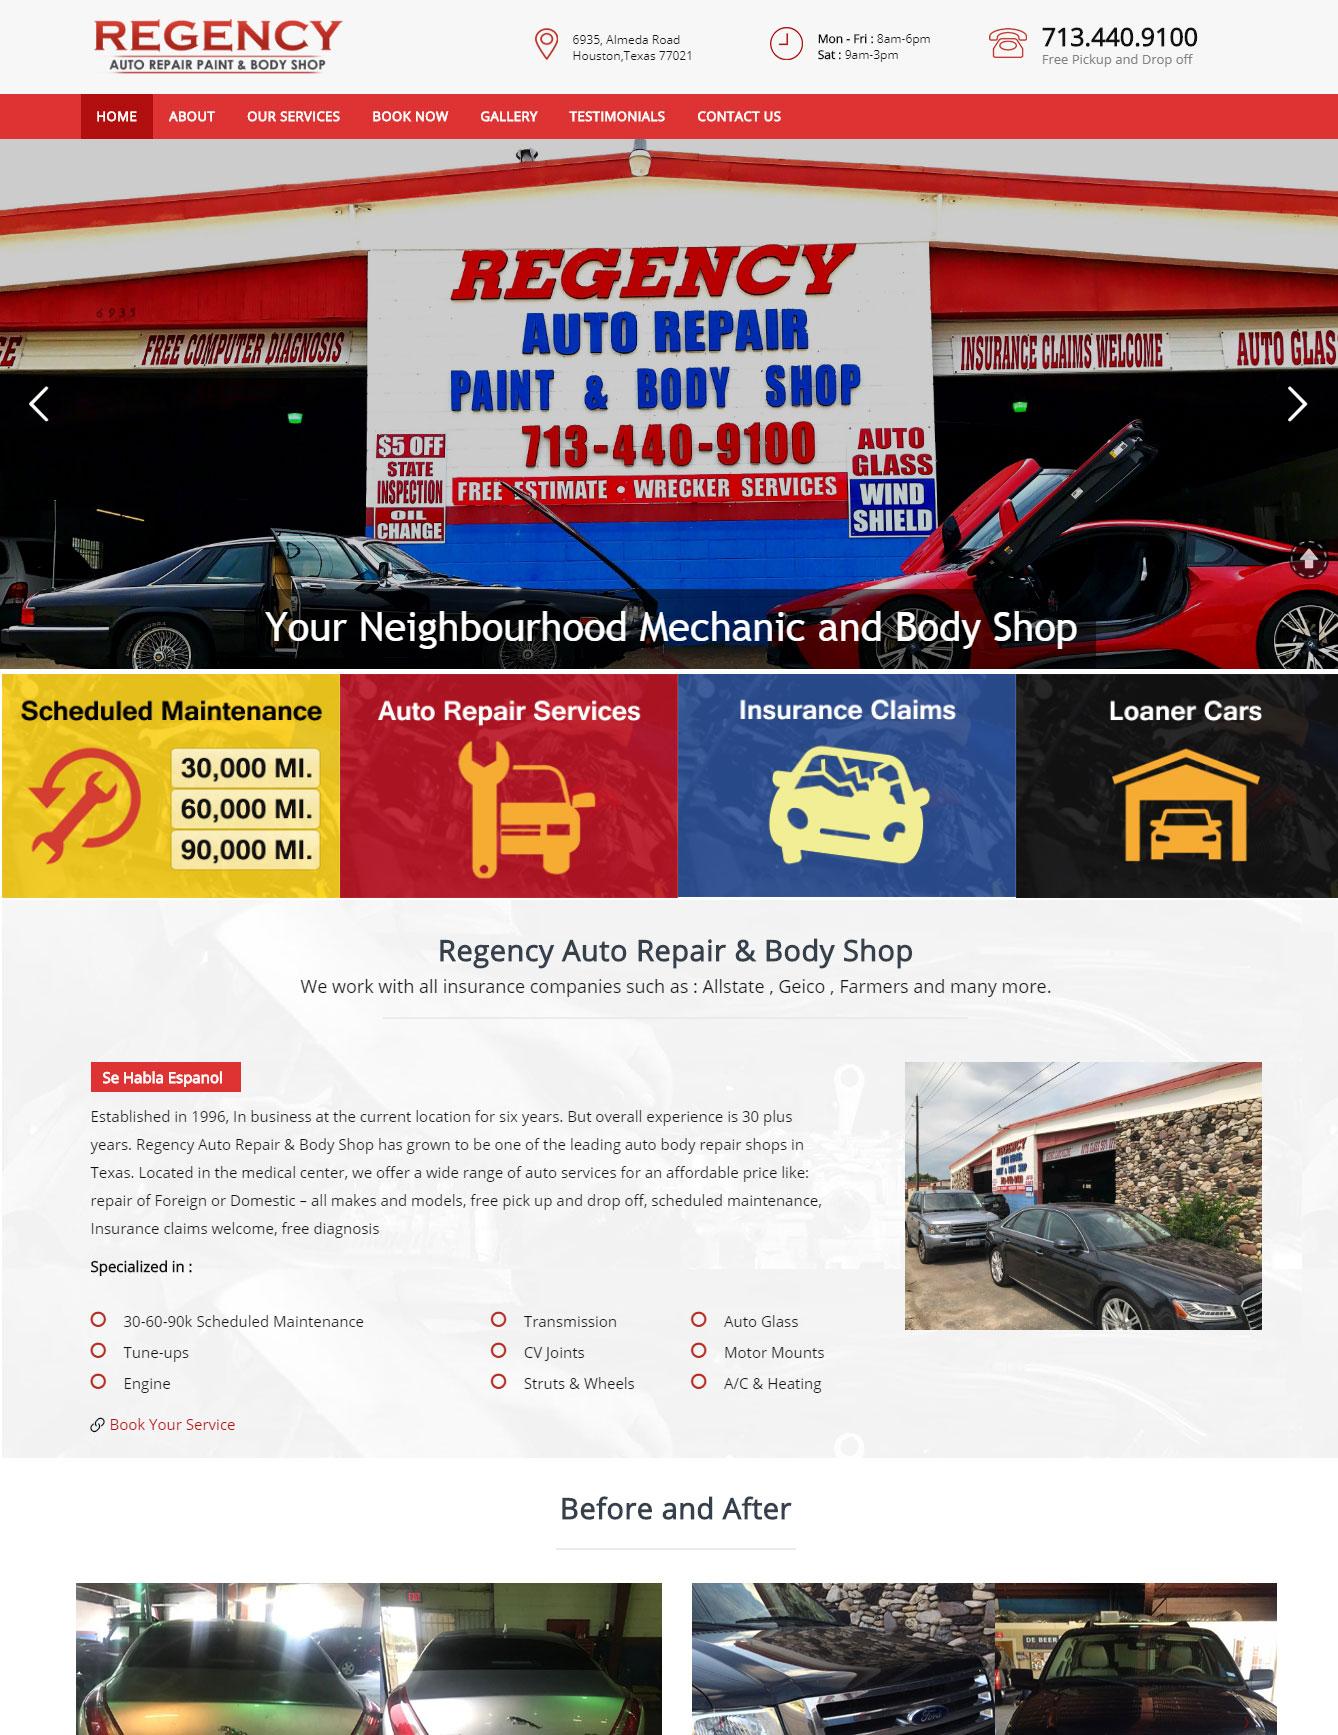 Regency Auto Repairs